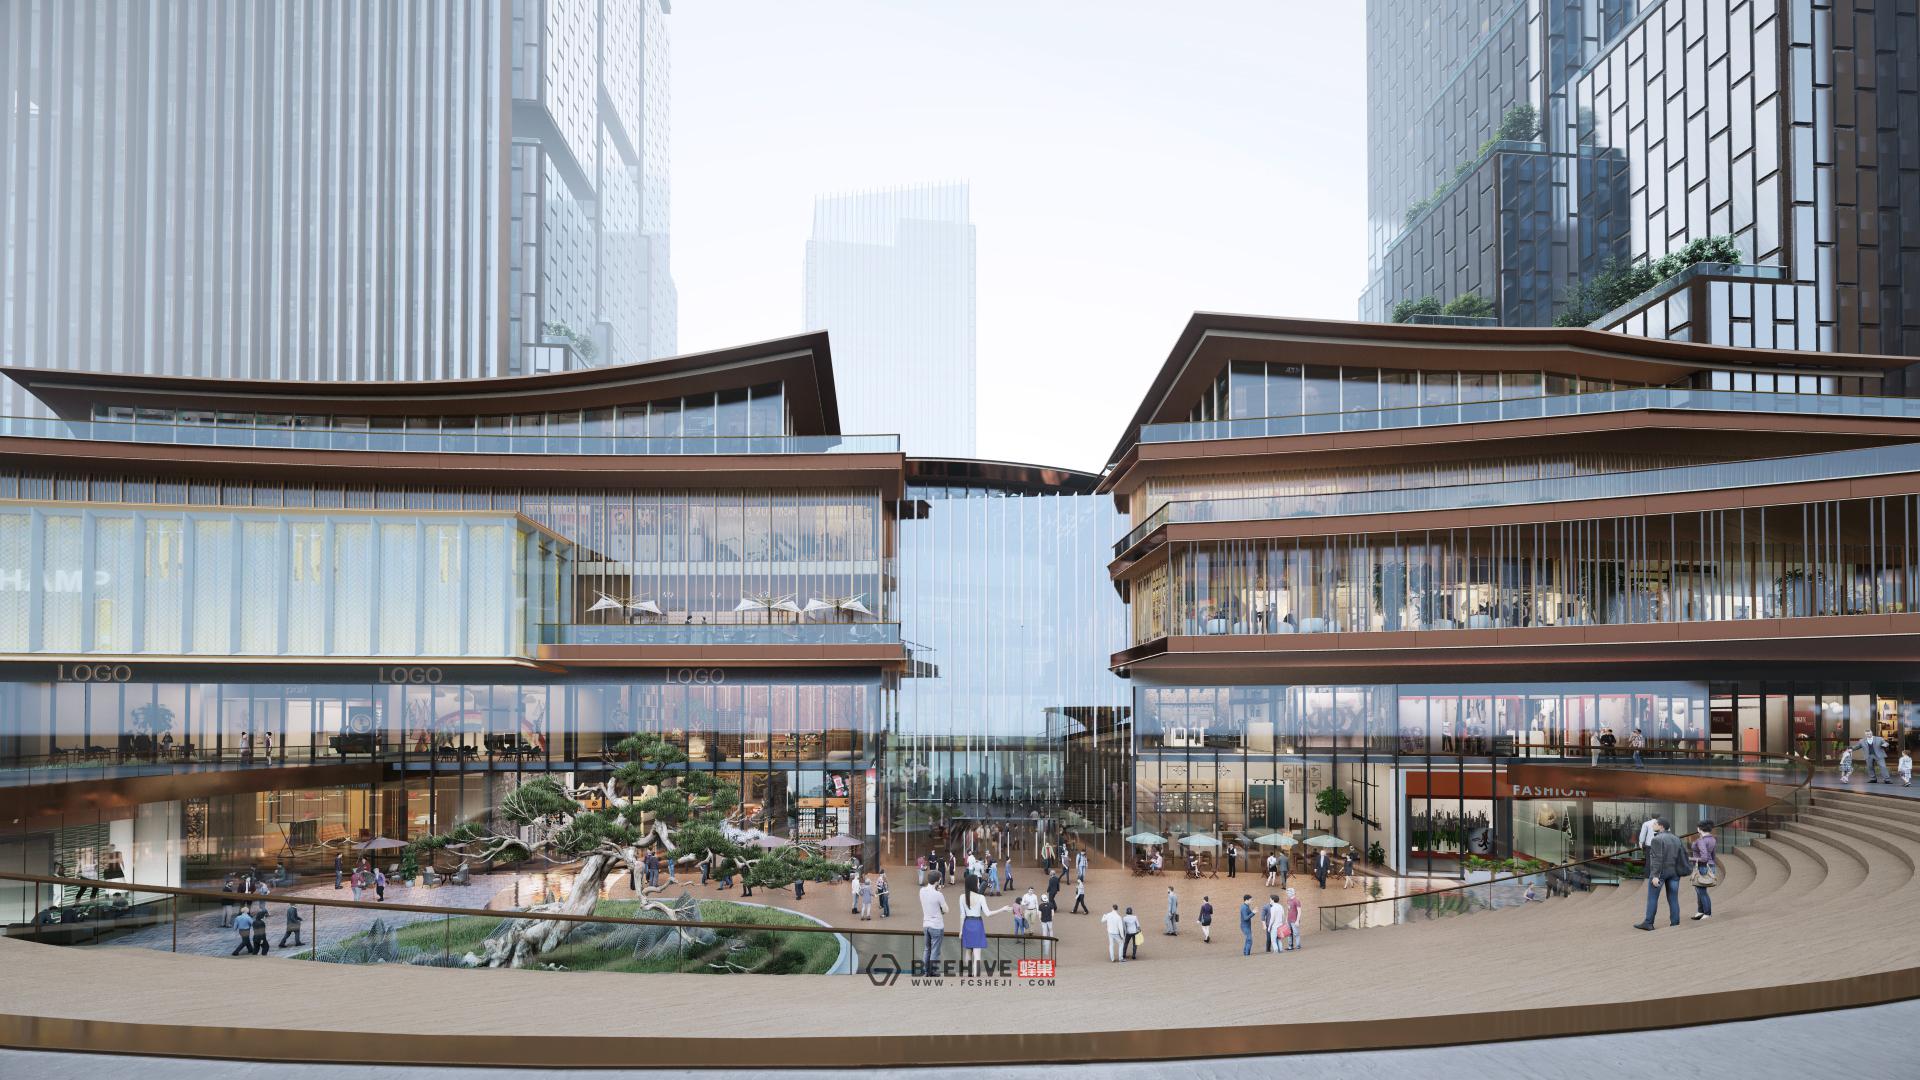 Hangzhou Fuyang Plot 73 Core Area Concept Design. Design and Project Architect: Aedas.